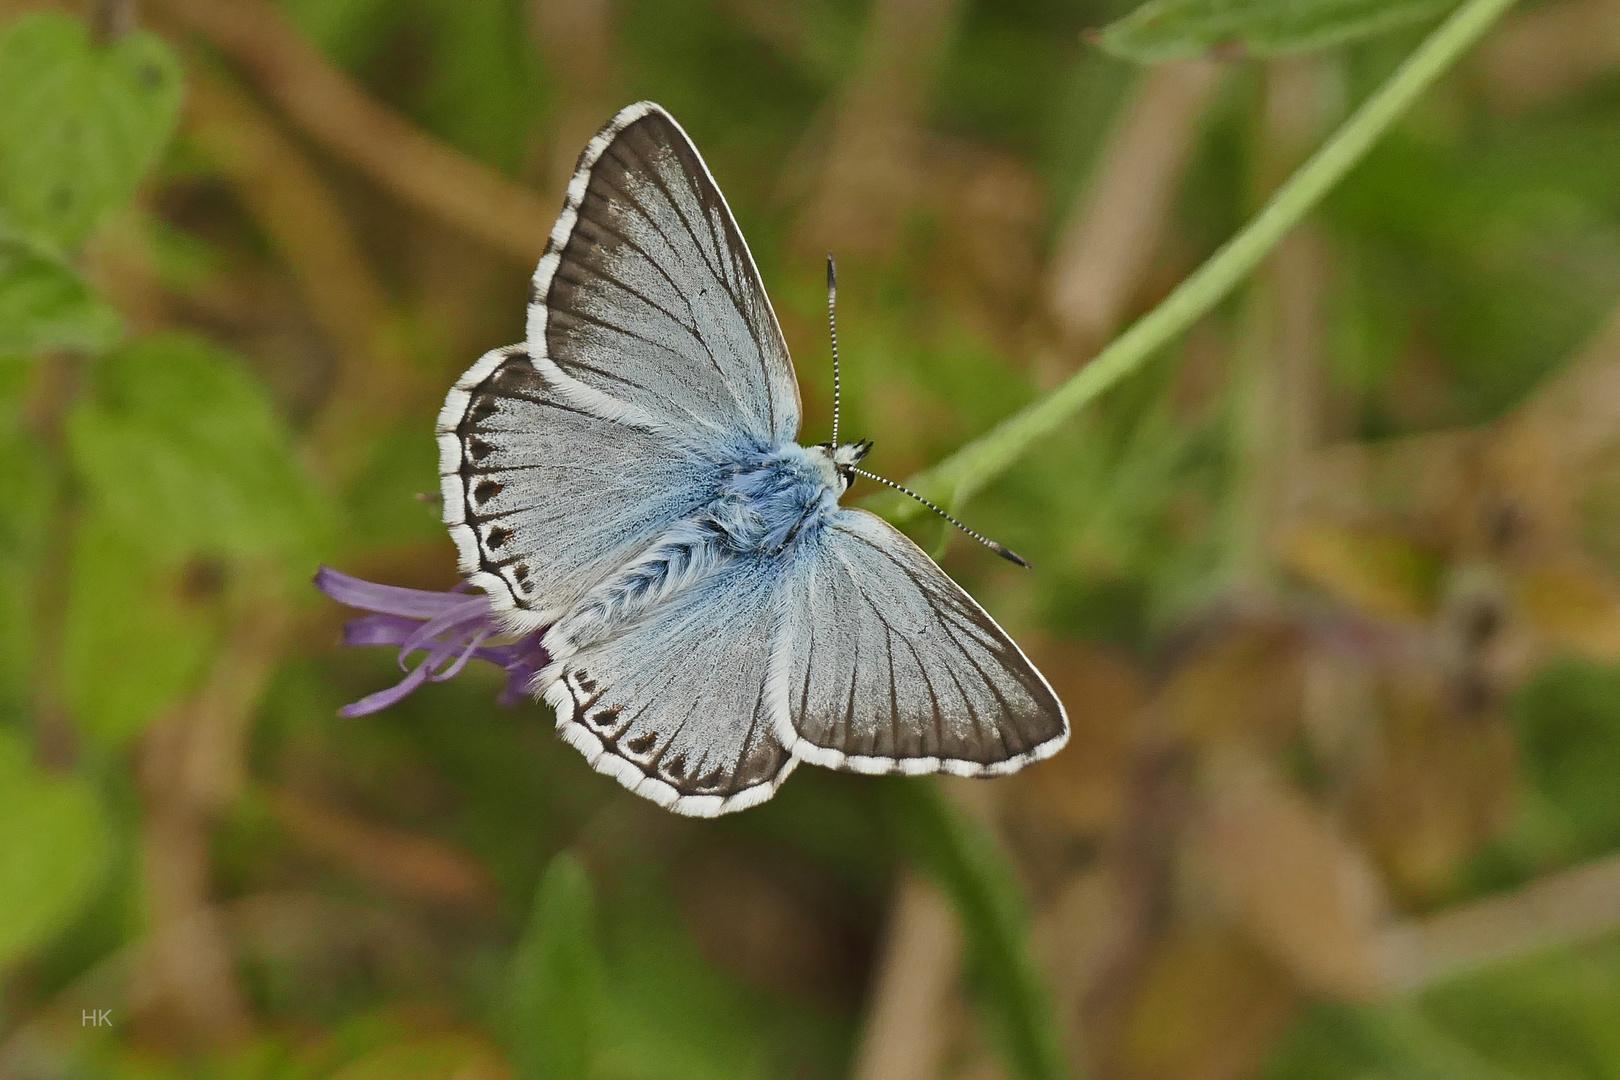 Bläuling (Silbergrüner Bläuling,Polyommatus coridon)